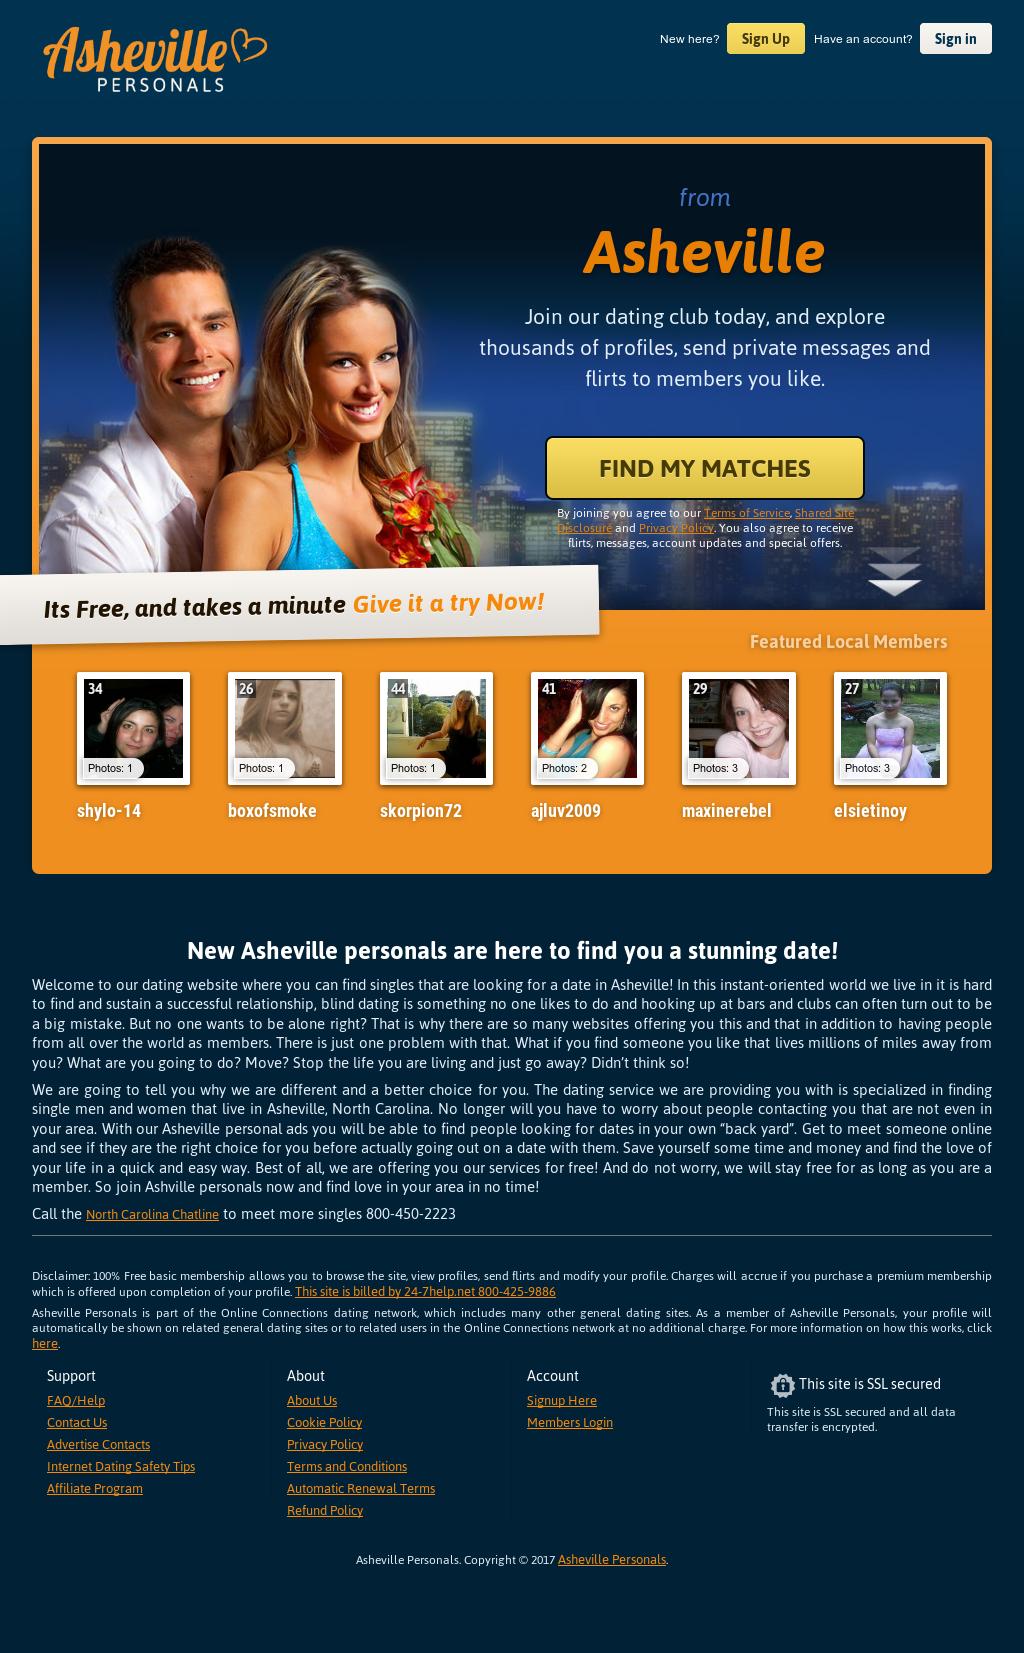 Asheville dating website